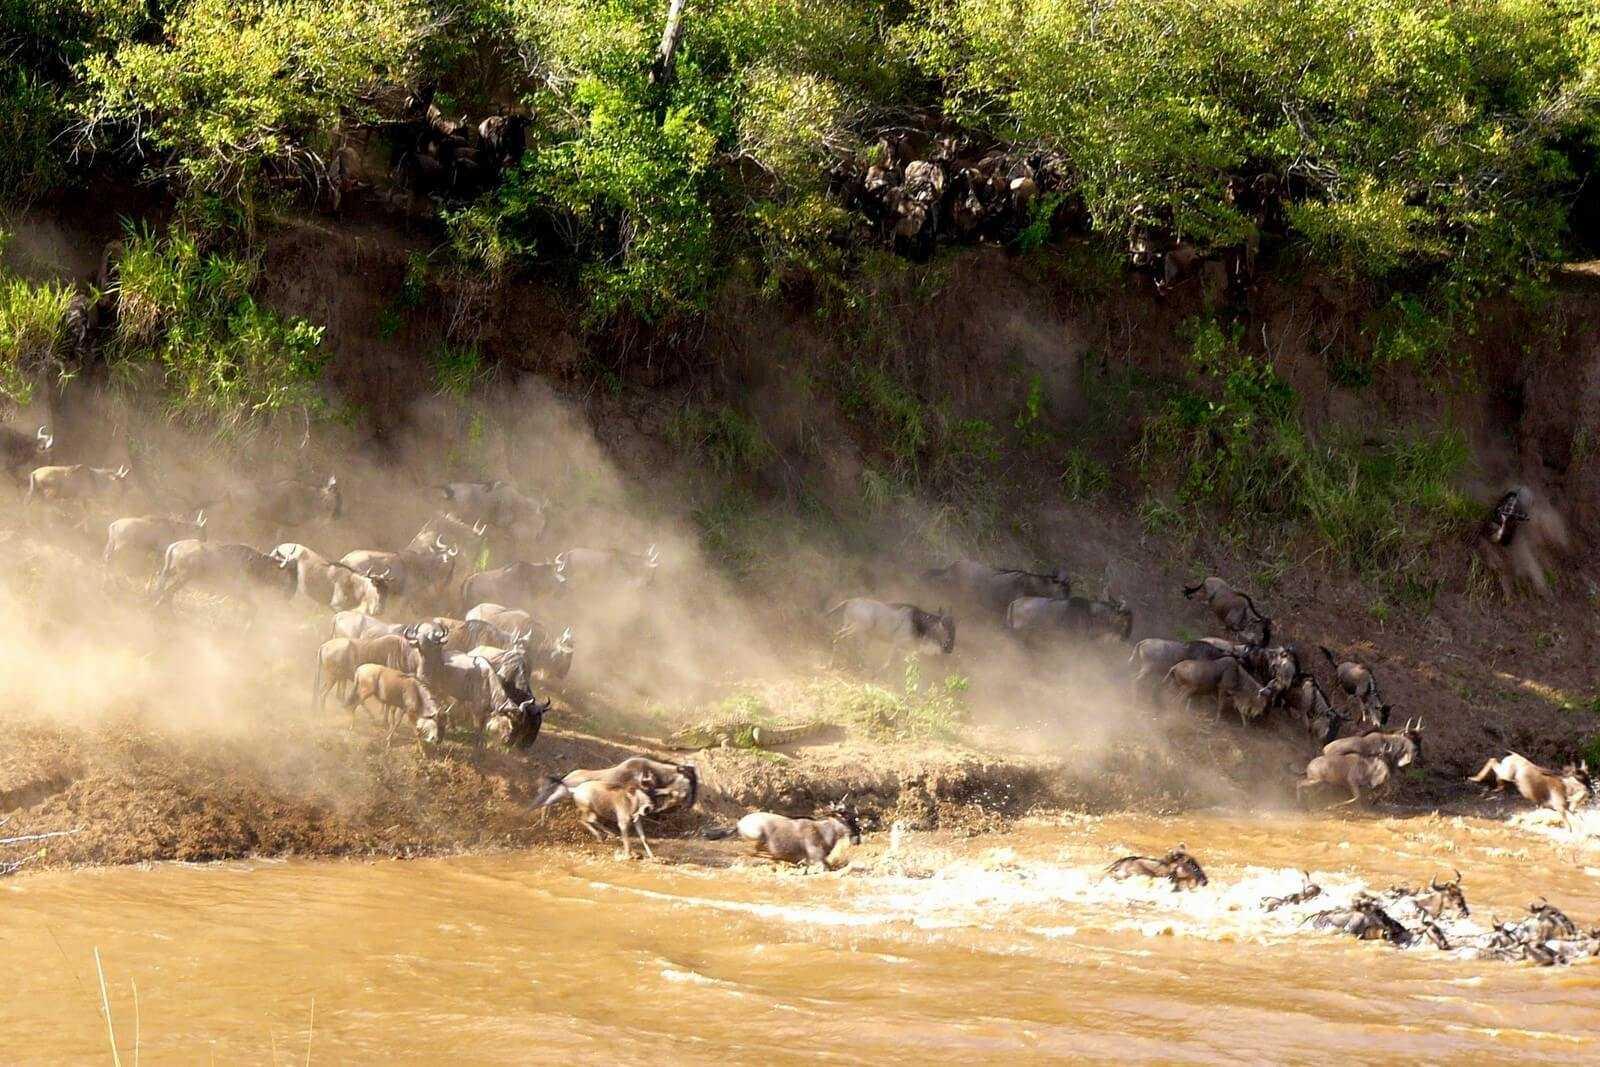 Kenya's National Parks - Masai Mara - Wildebeest Migration